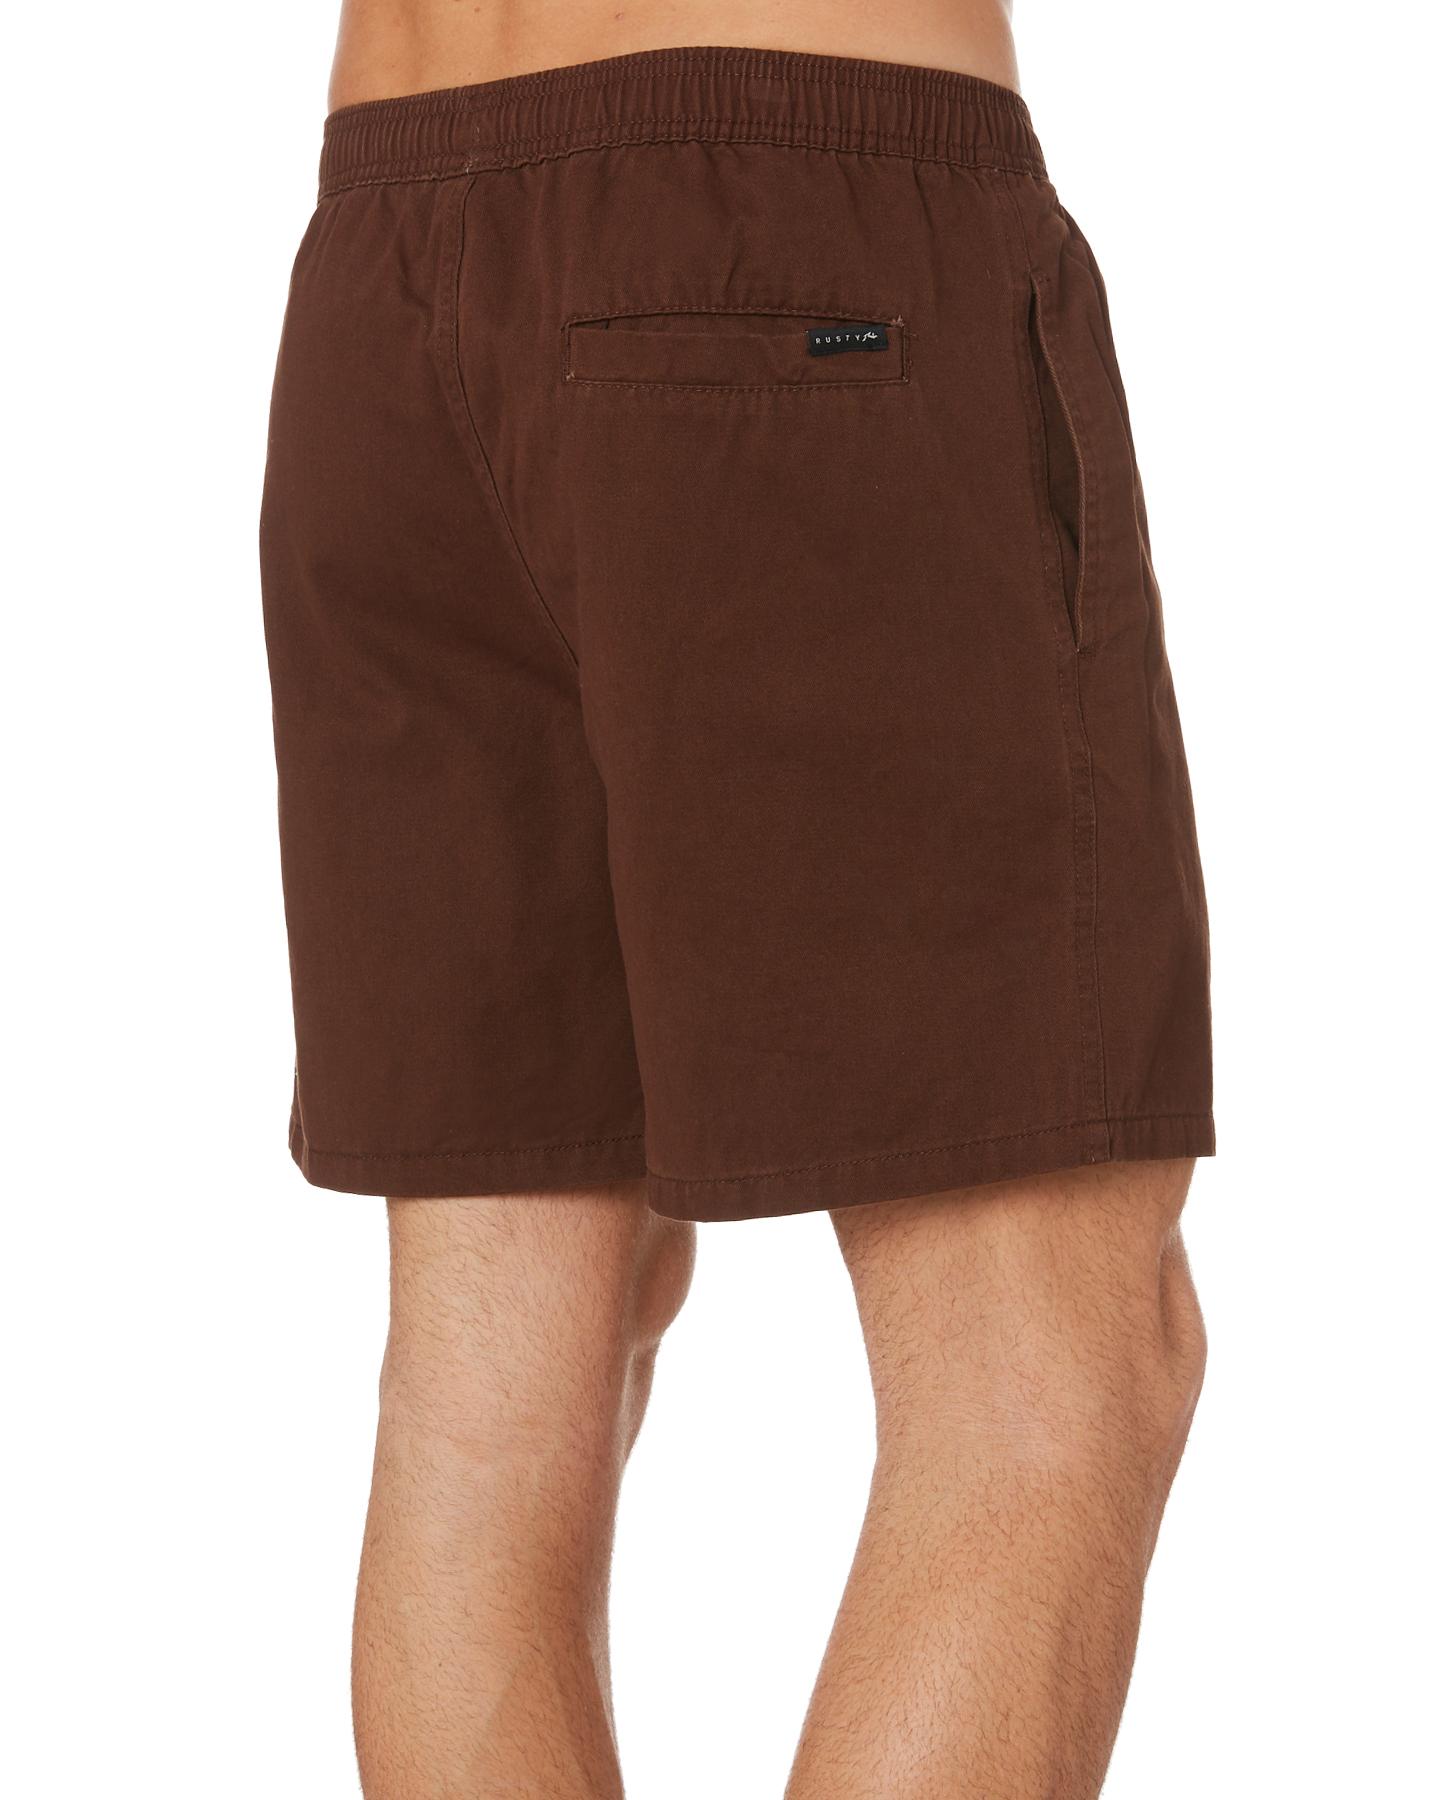 New-Rusty-Men-039-s-Hook-Elastic-Short-Cotton-Blue thumbnail 9